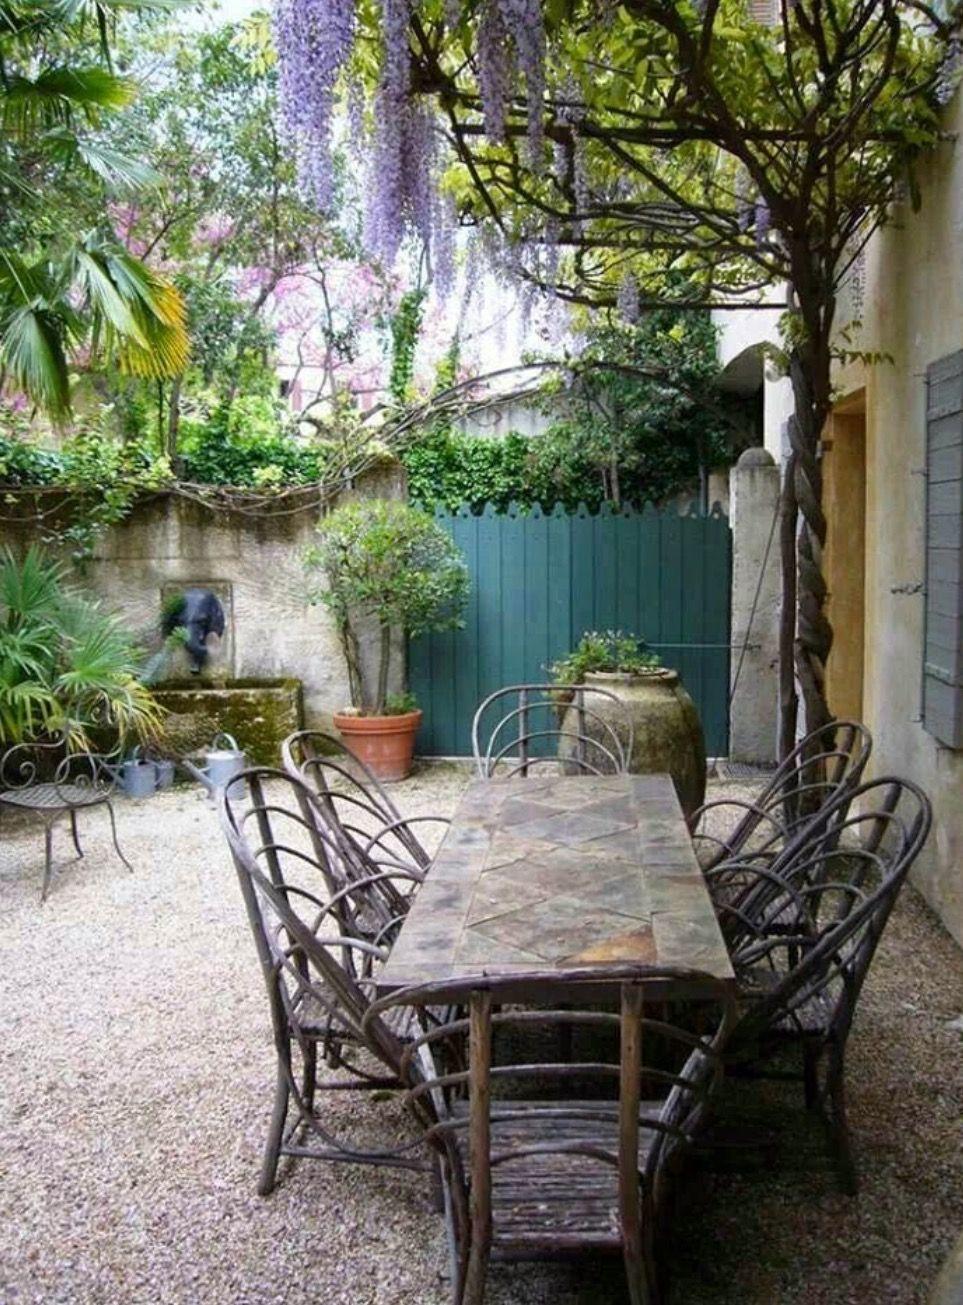 privacylandscape chiles family ideas pinterest gardens patios